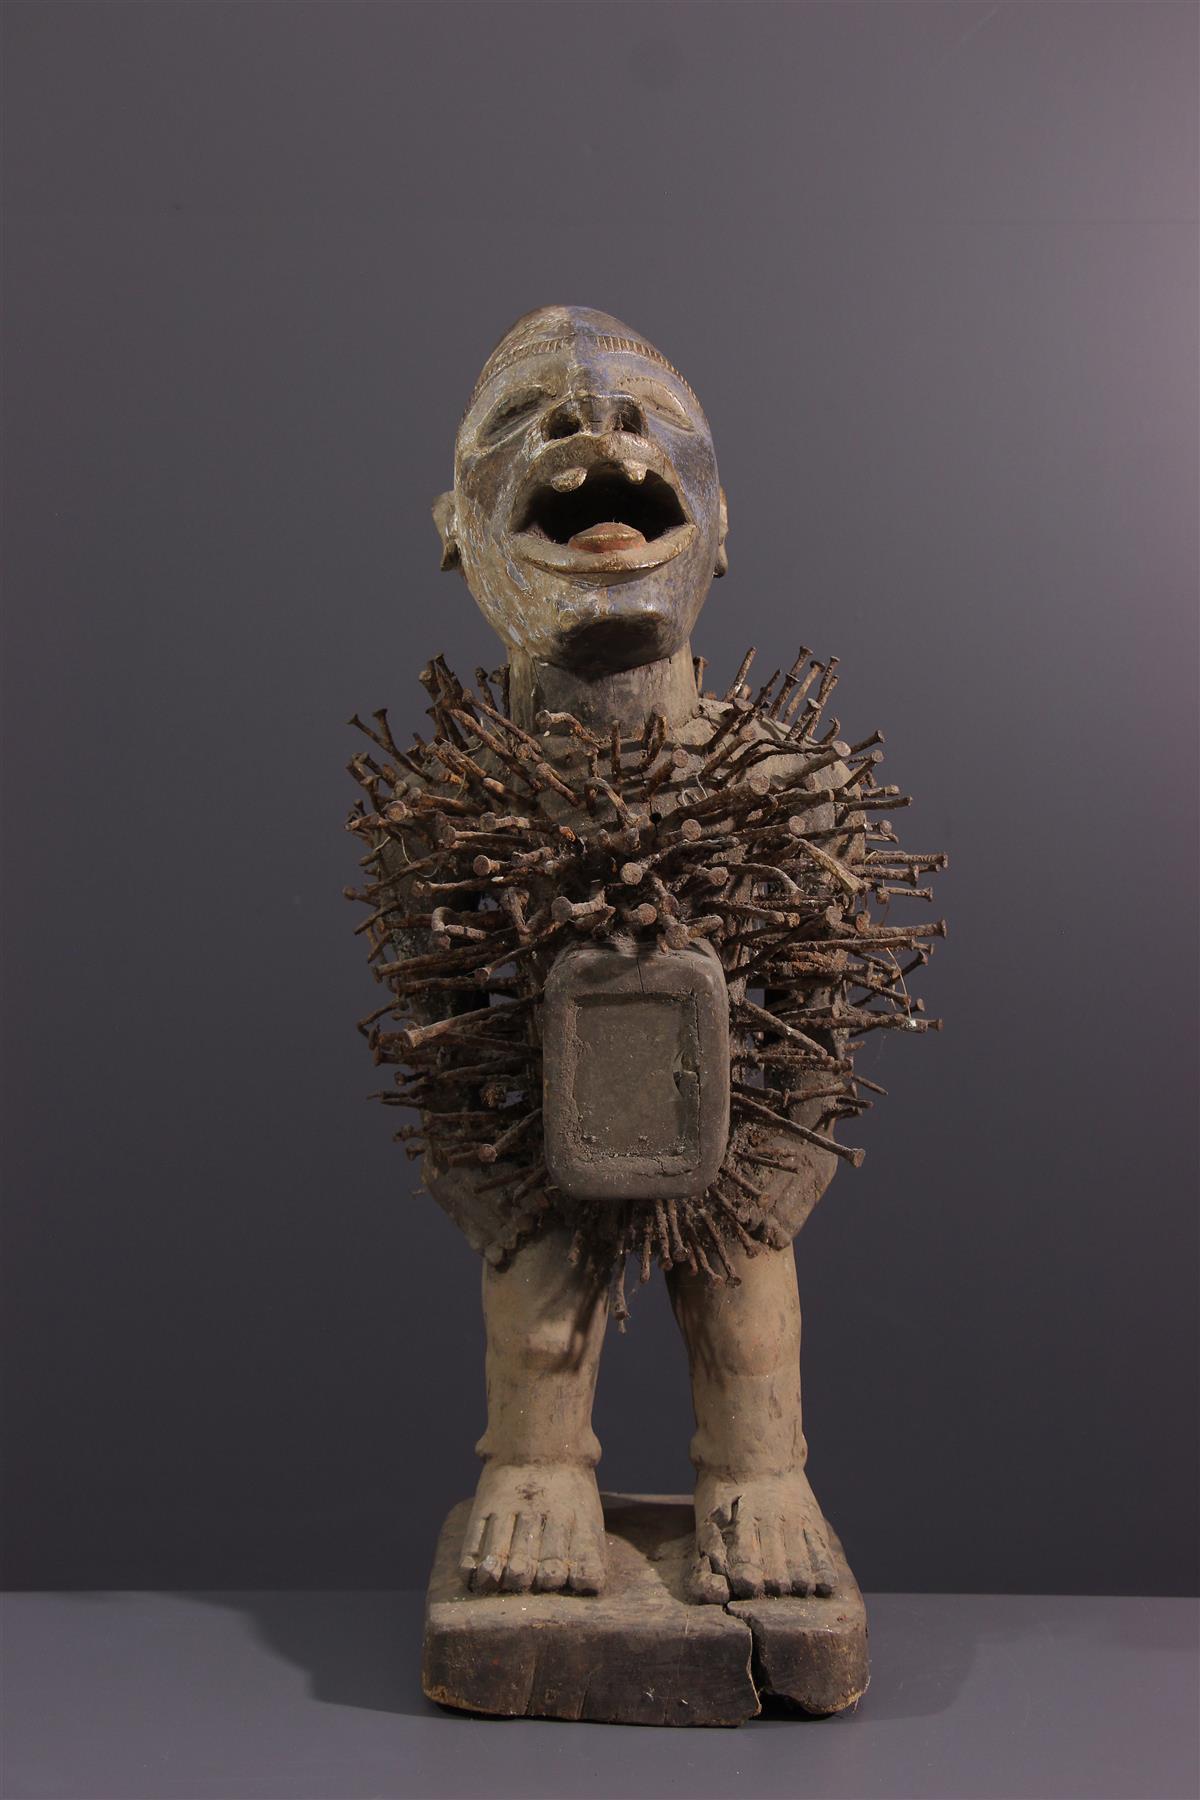 Nkondi standbeeld - Tribale kunst